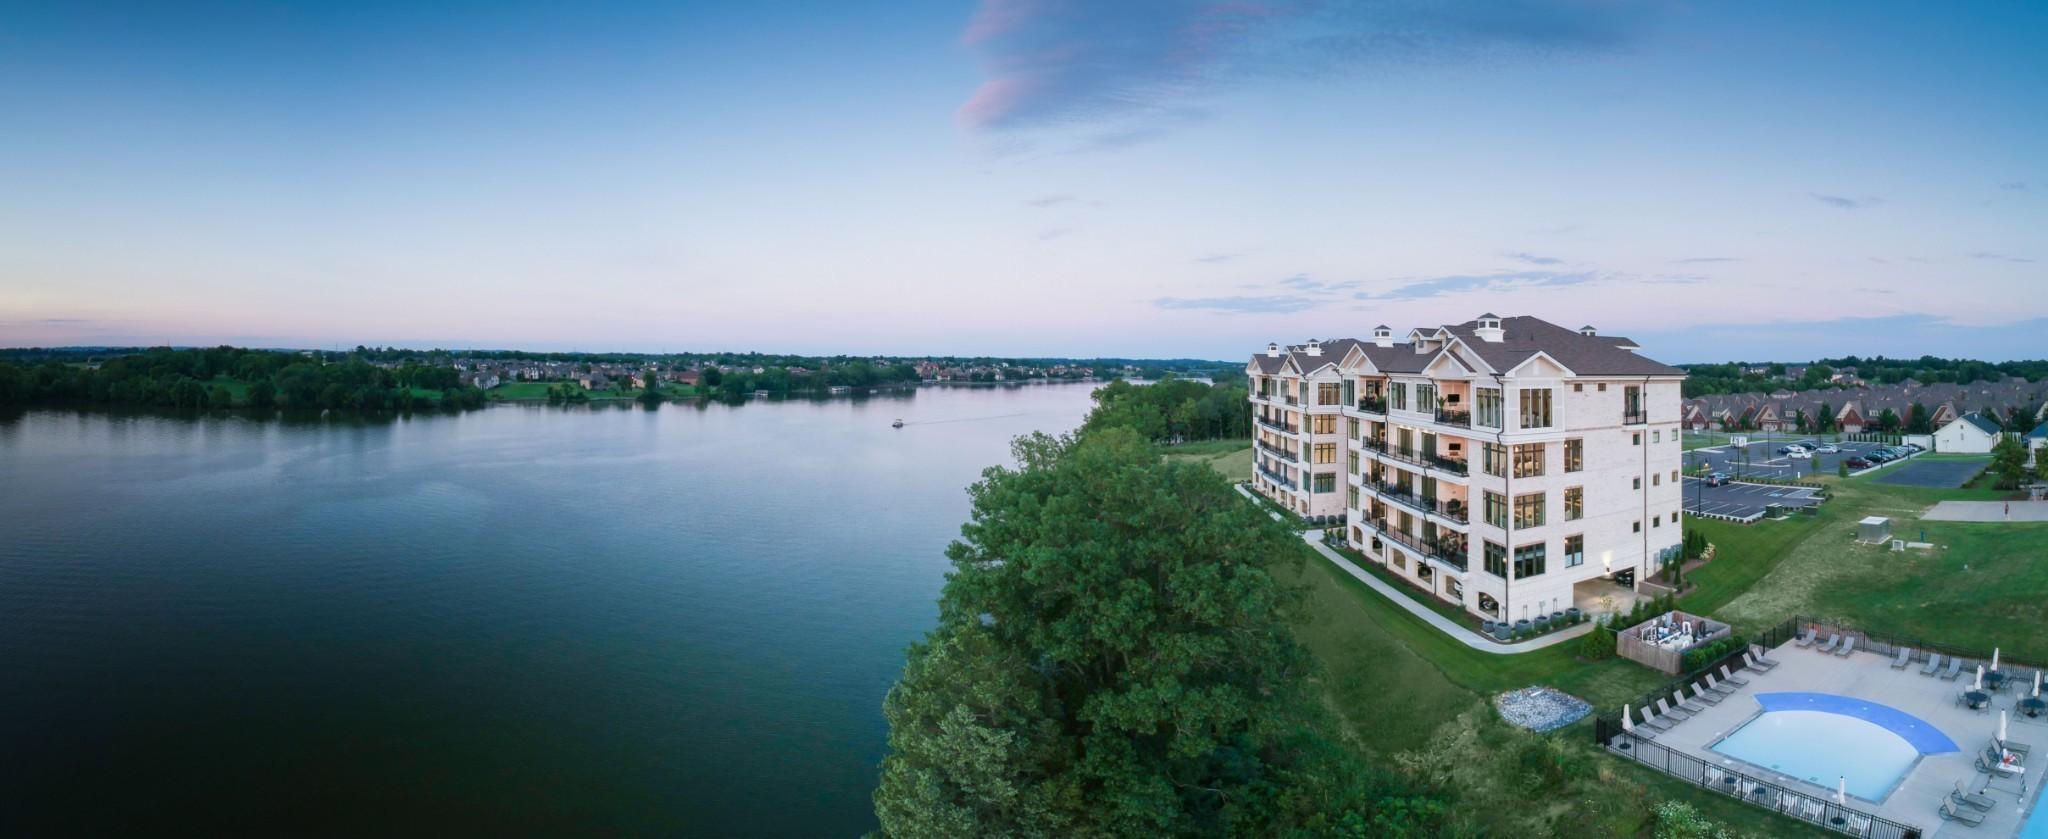 1024 Club View Dr #C201 Property Photo - Gallatin, TN real estate listing